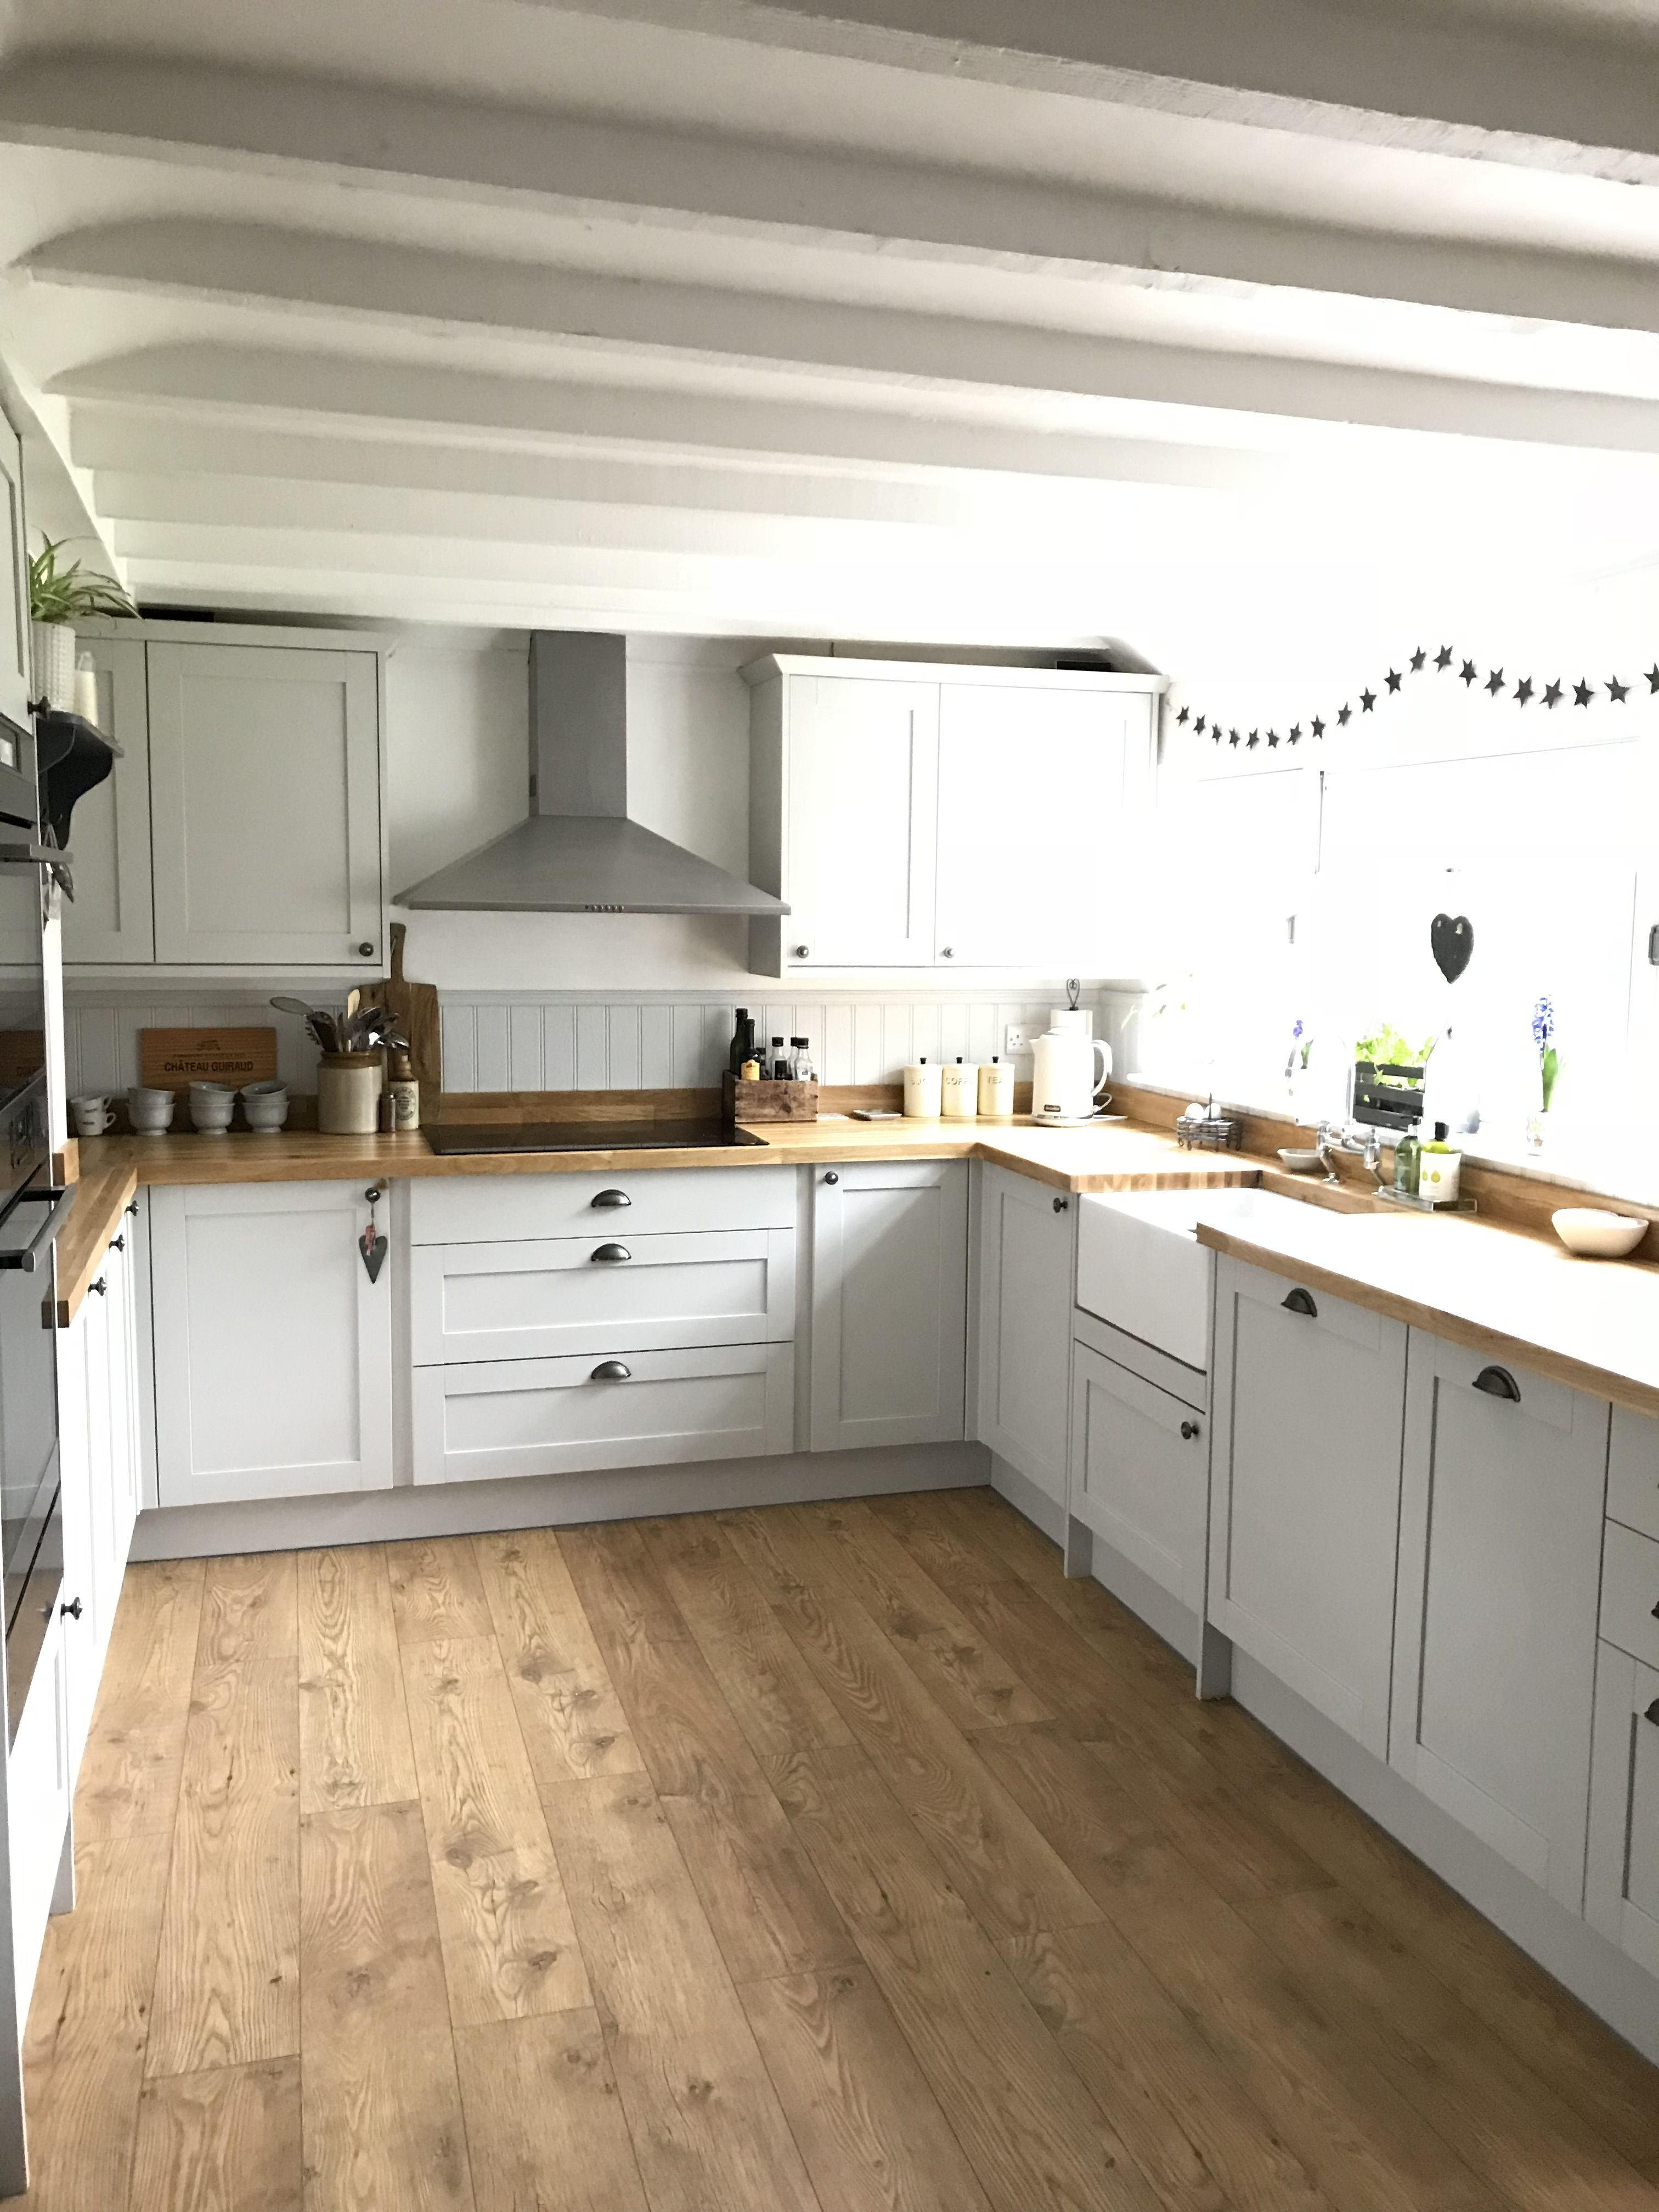 Best Kitchens Kitchen Decor Home Decor Kitchen Rustic Kitchen 400 x 300